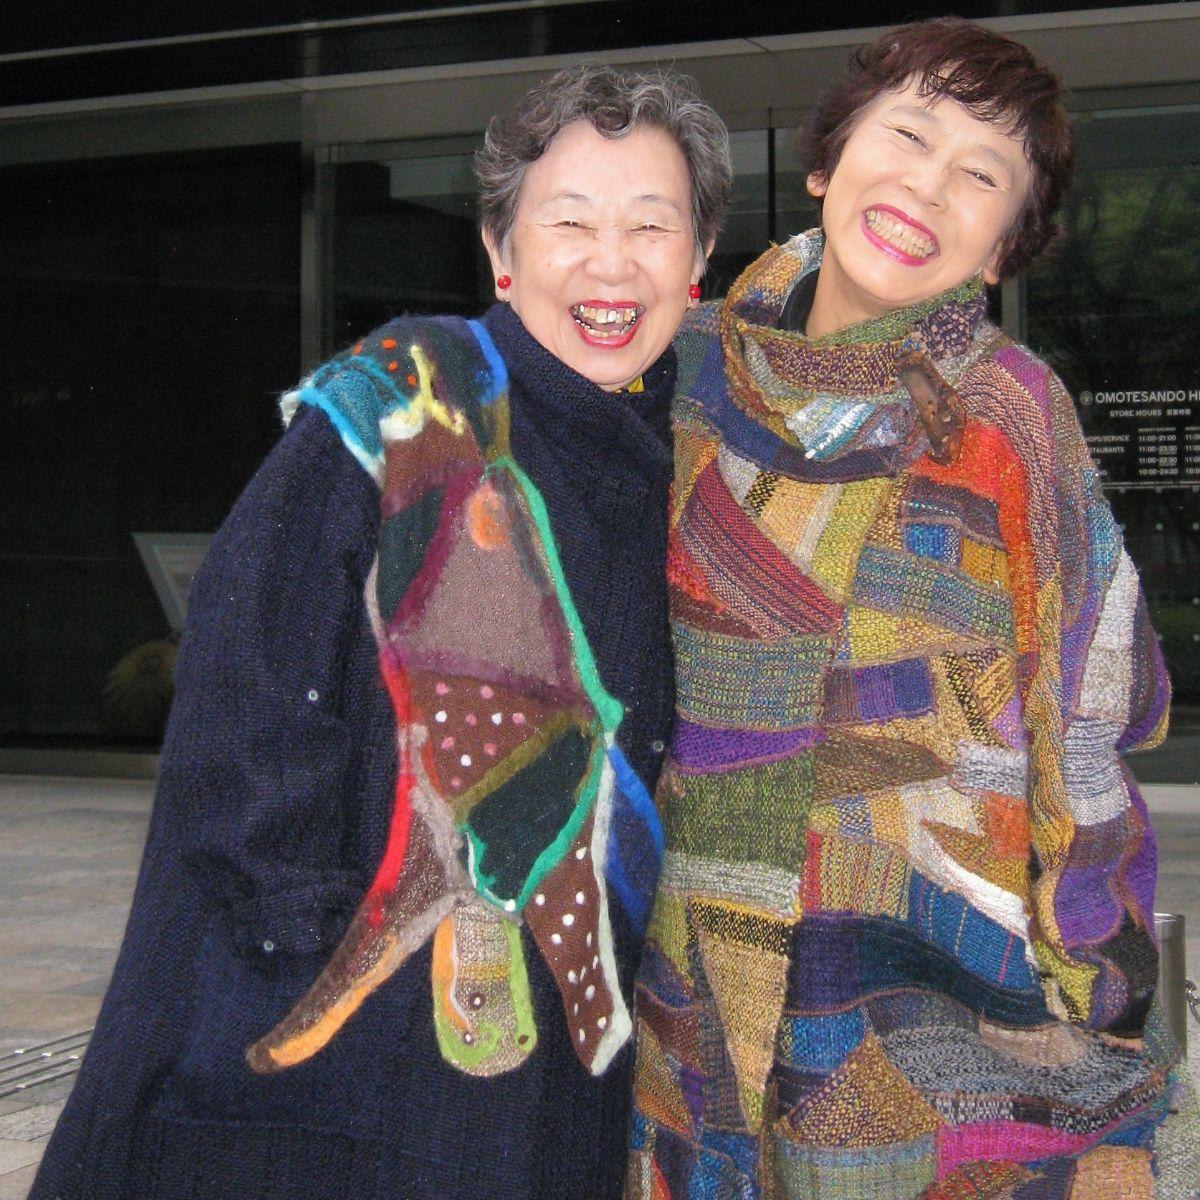 Iwasaki/Umehara for Fufufu Fuku